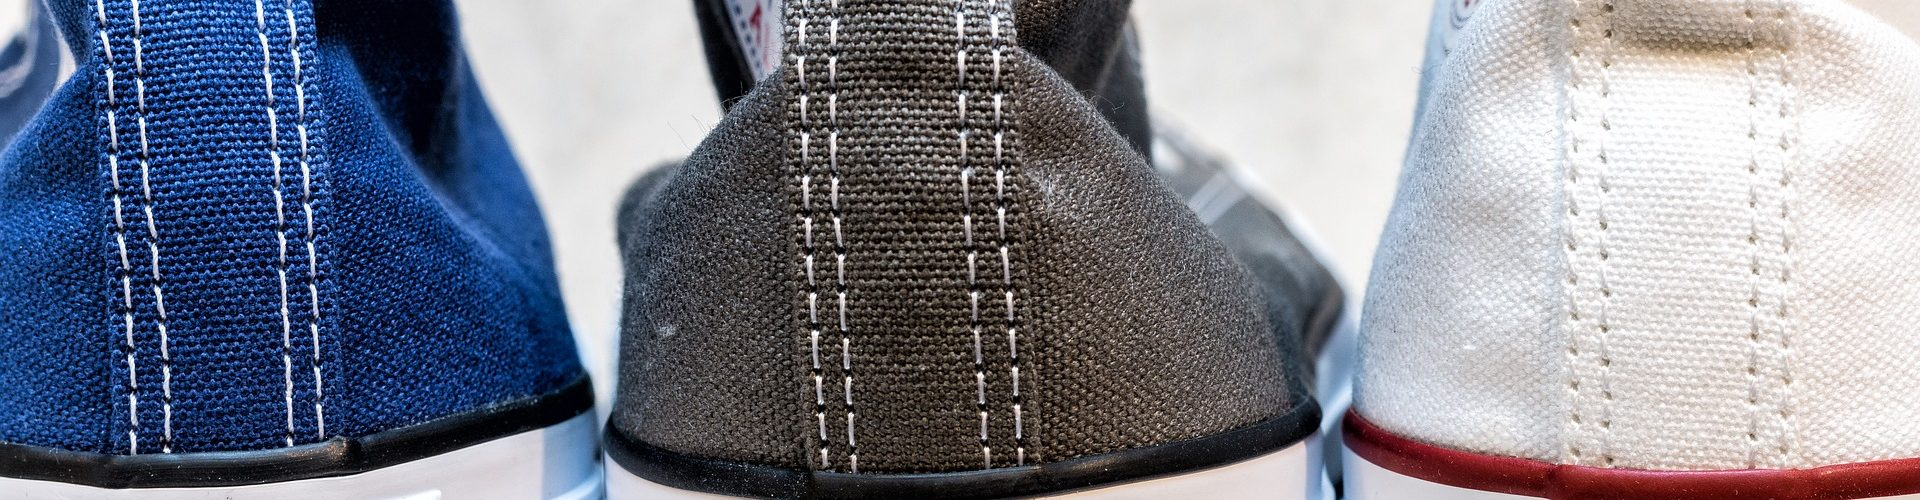 Converse Schuhgrößen